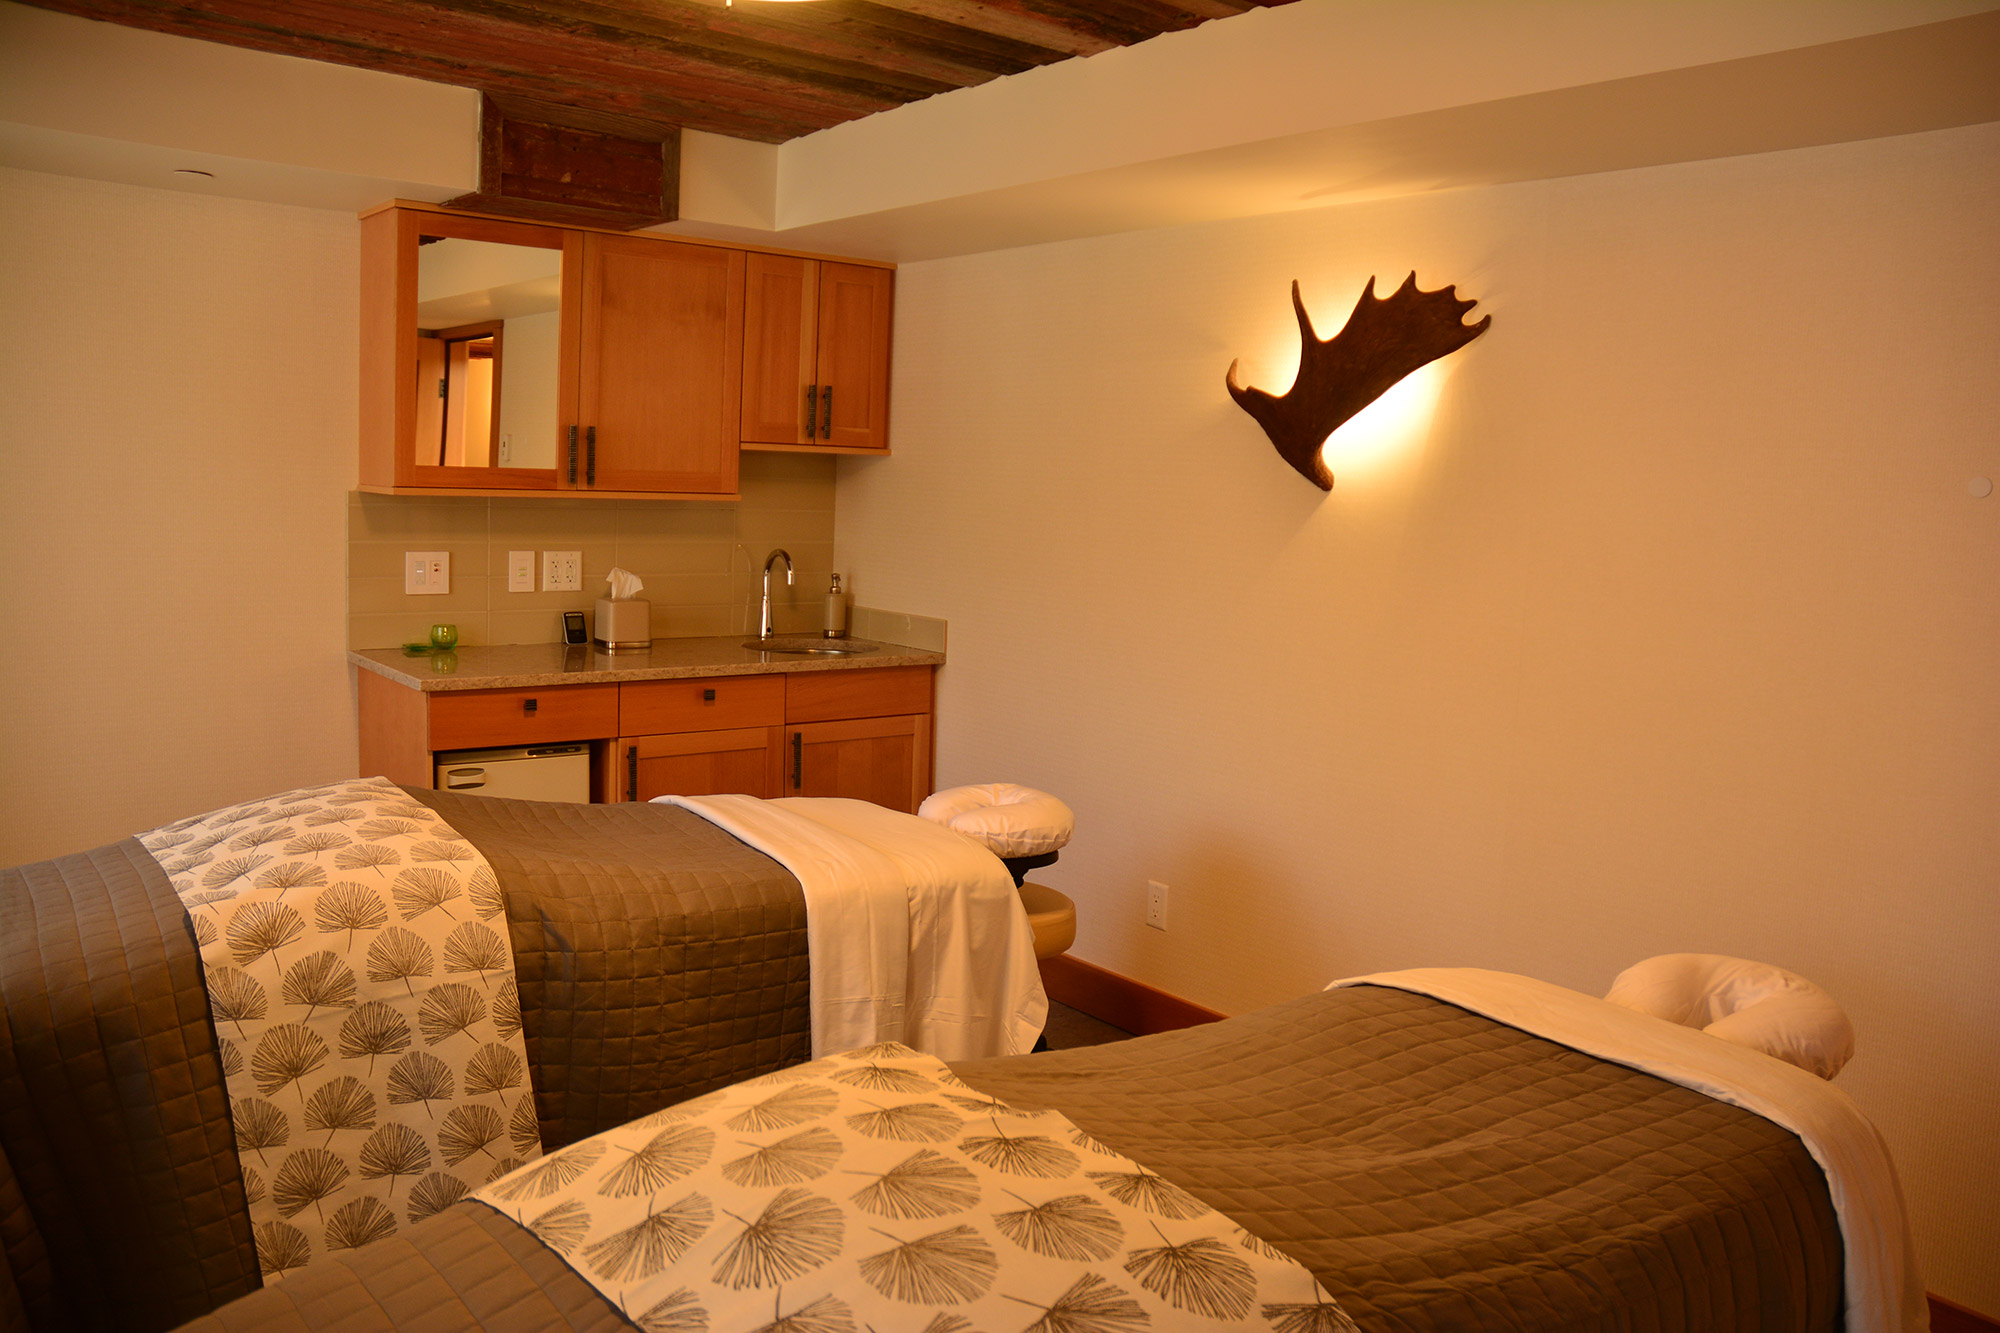 Meadow Spa & Pools - Treatment Room